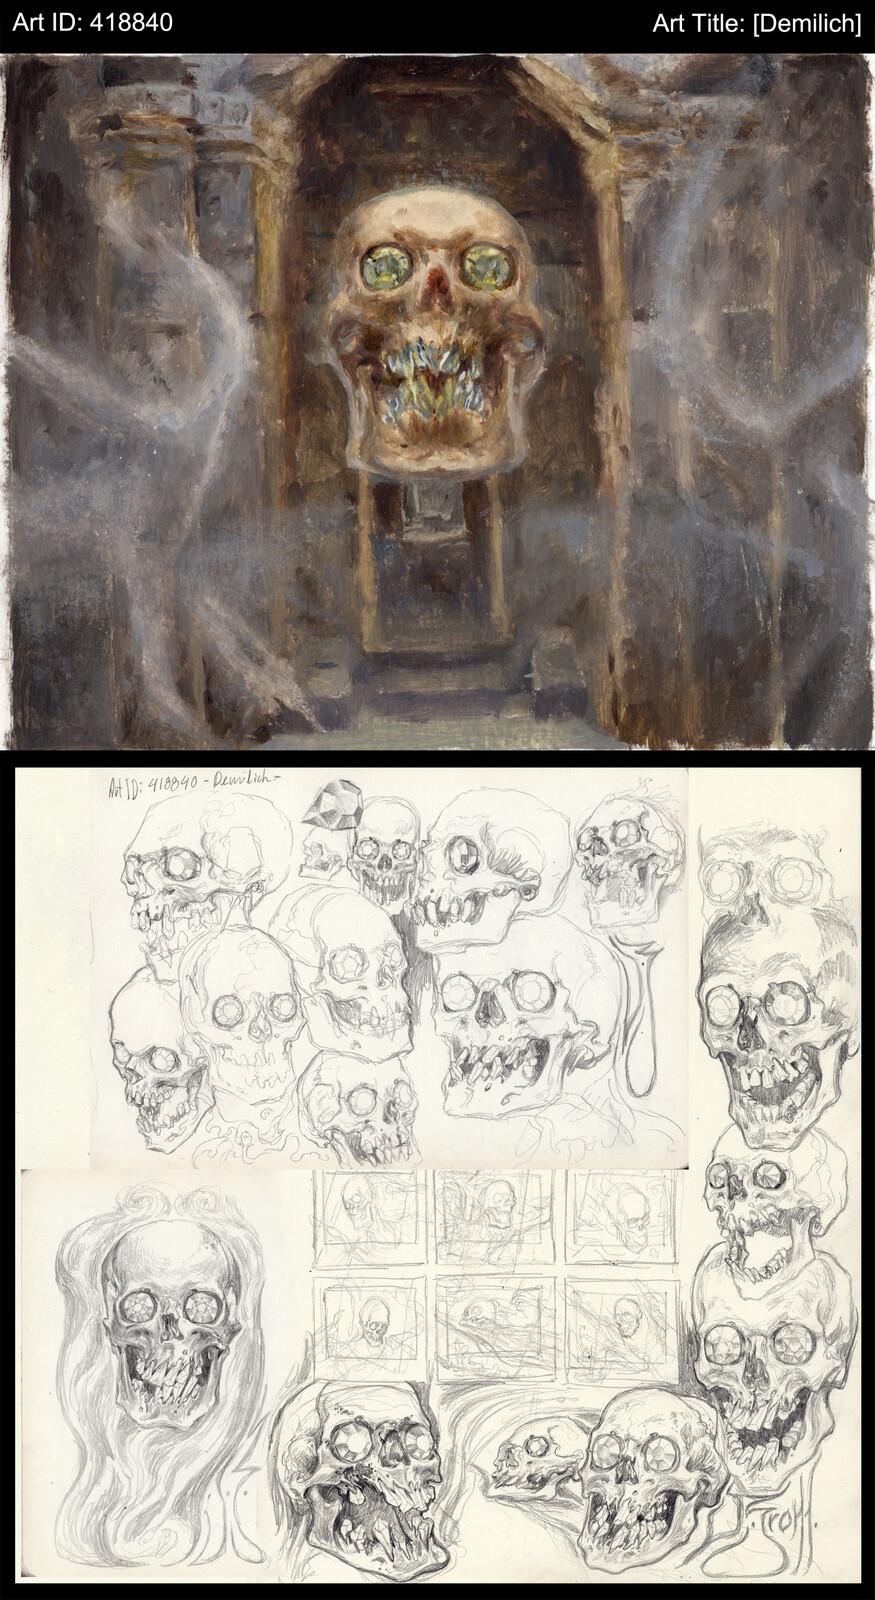 Color sketch: Oils on paper, 17 x 14cm